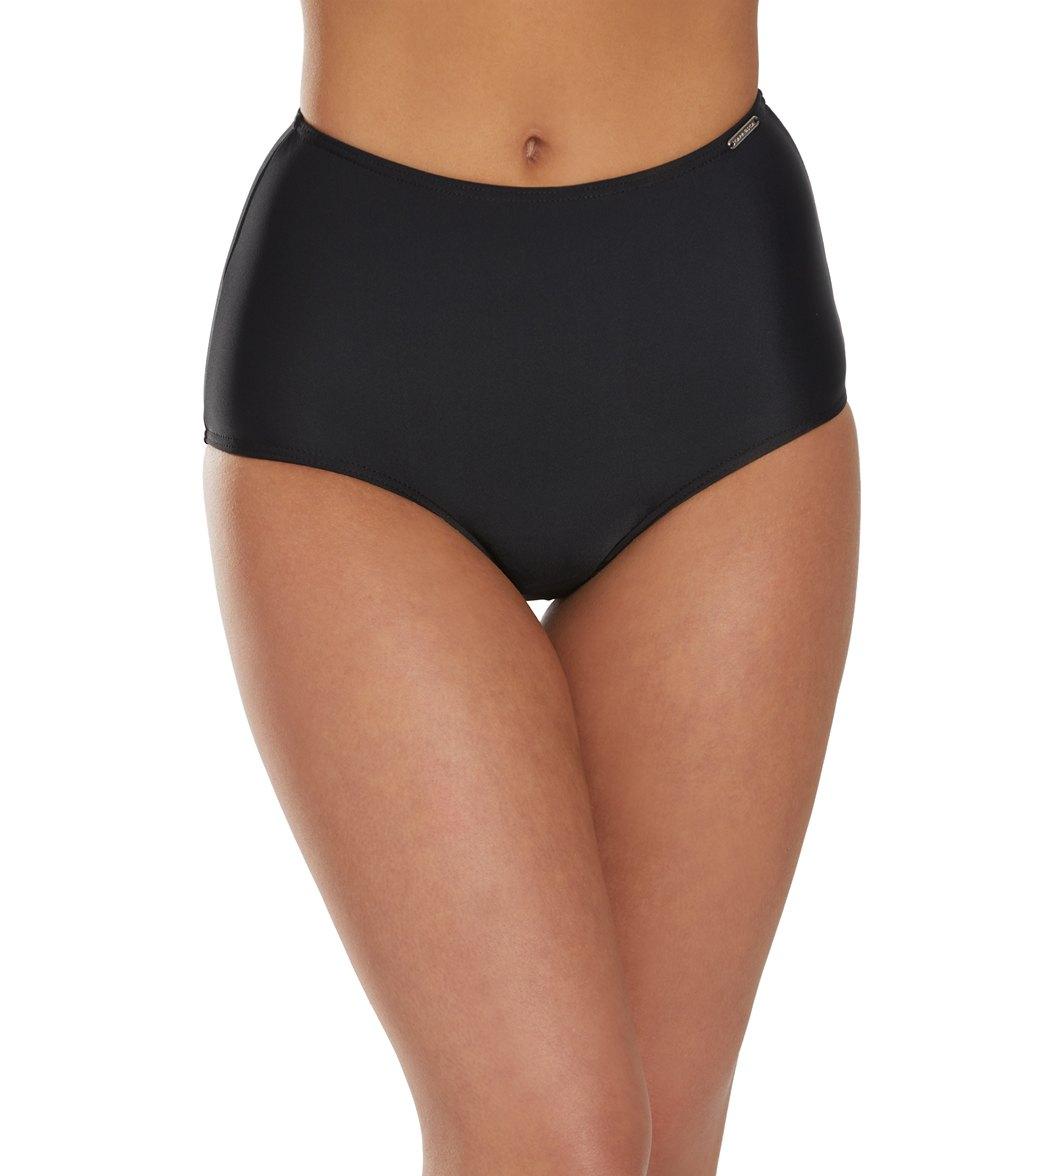 Capriosca Solid High Waisted Bikini Bottom